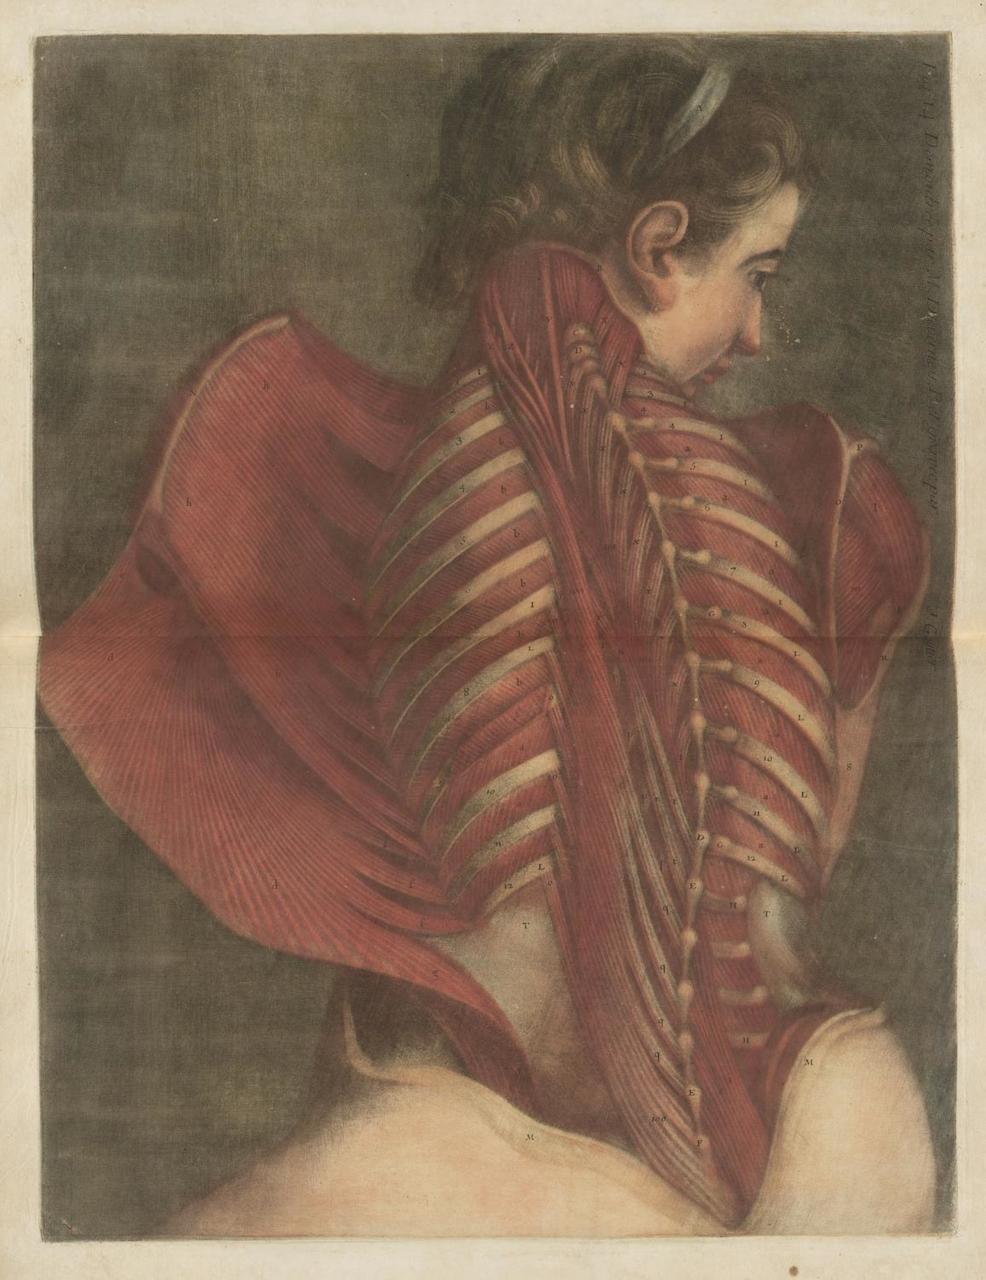 Cast Iron Paint >> 18th-Century Anatomical Illustrations Reveal Flayed Flesh and Shining Bones